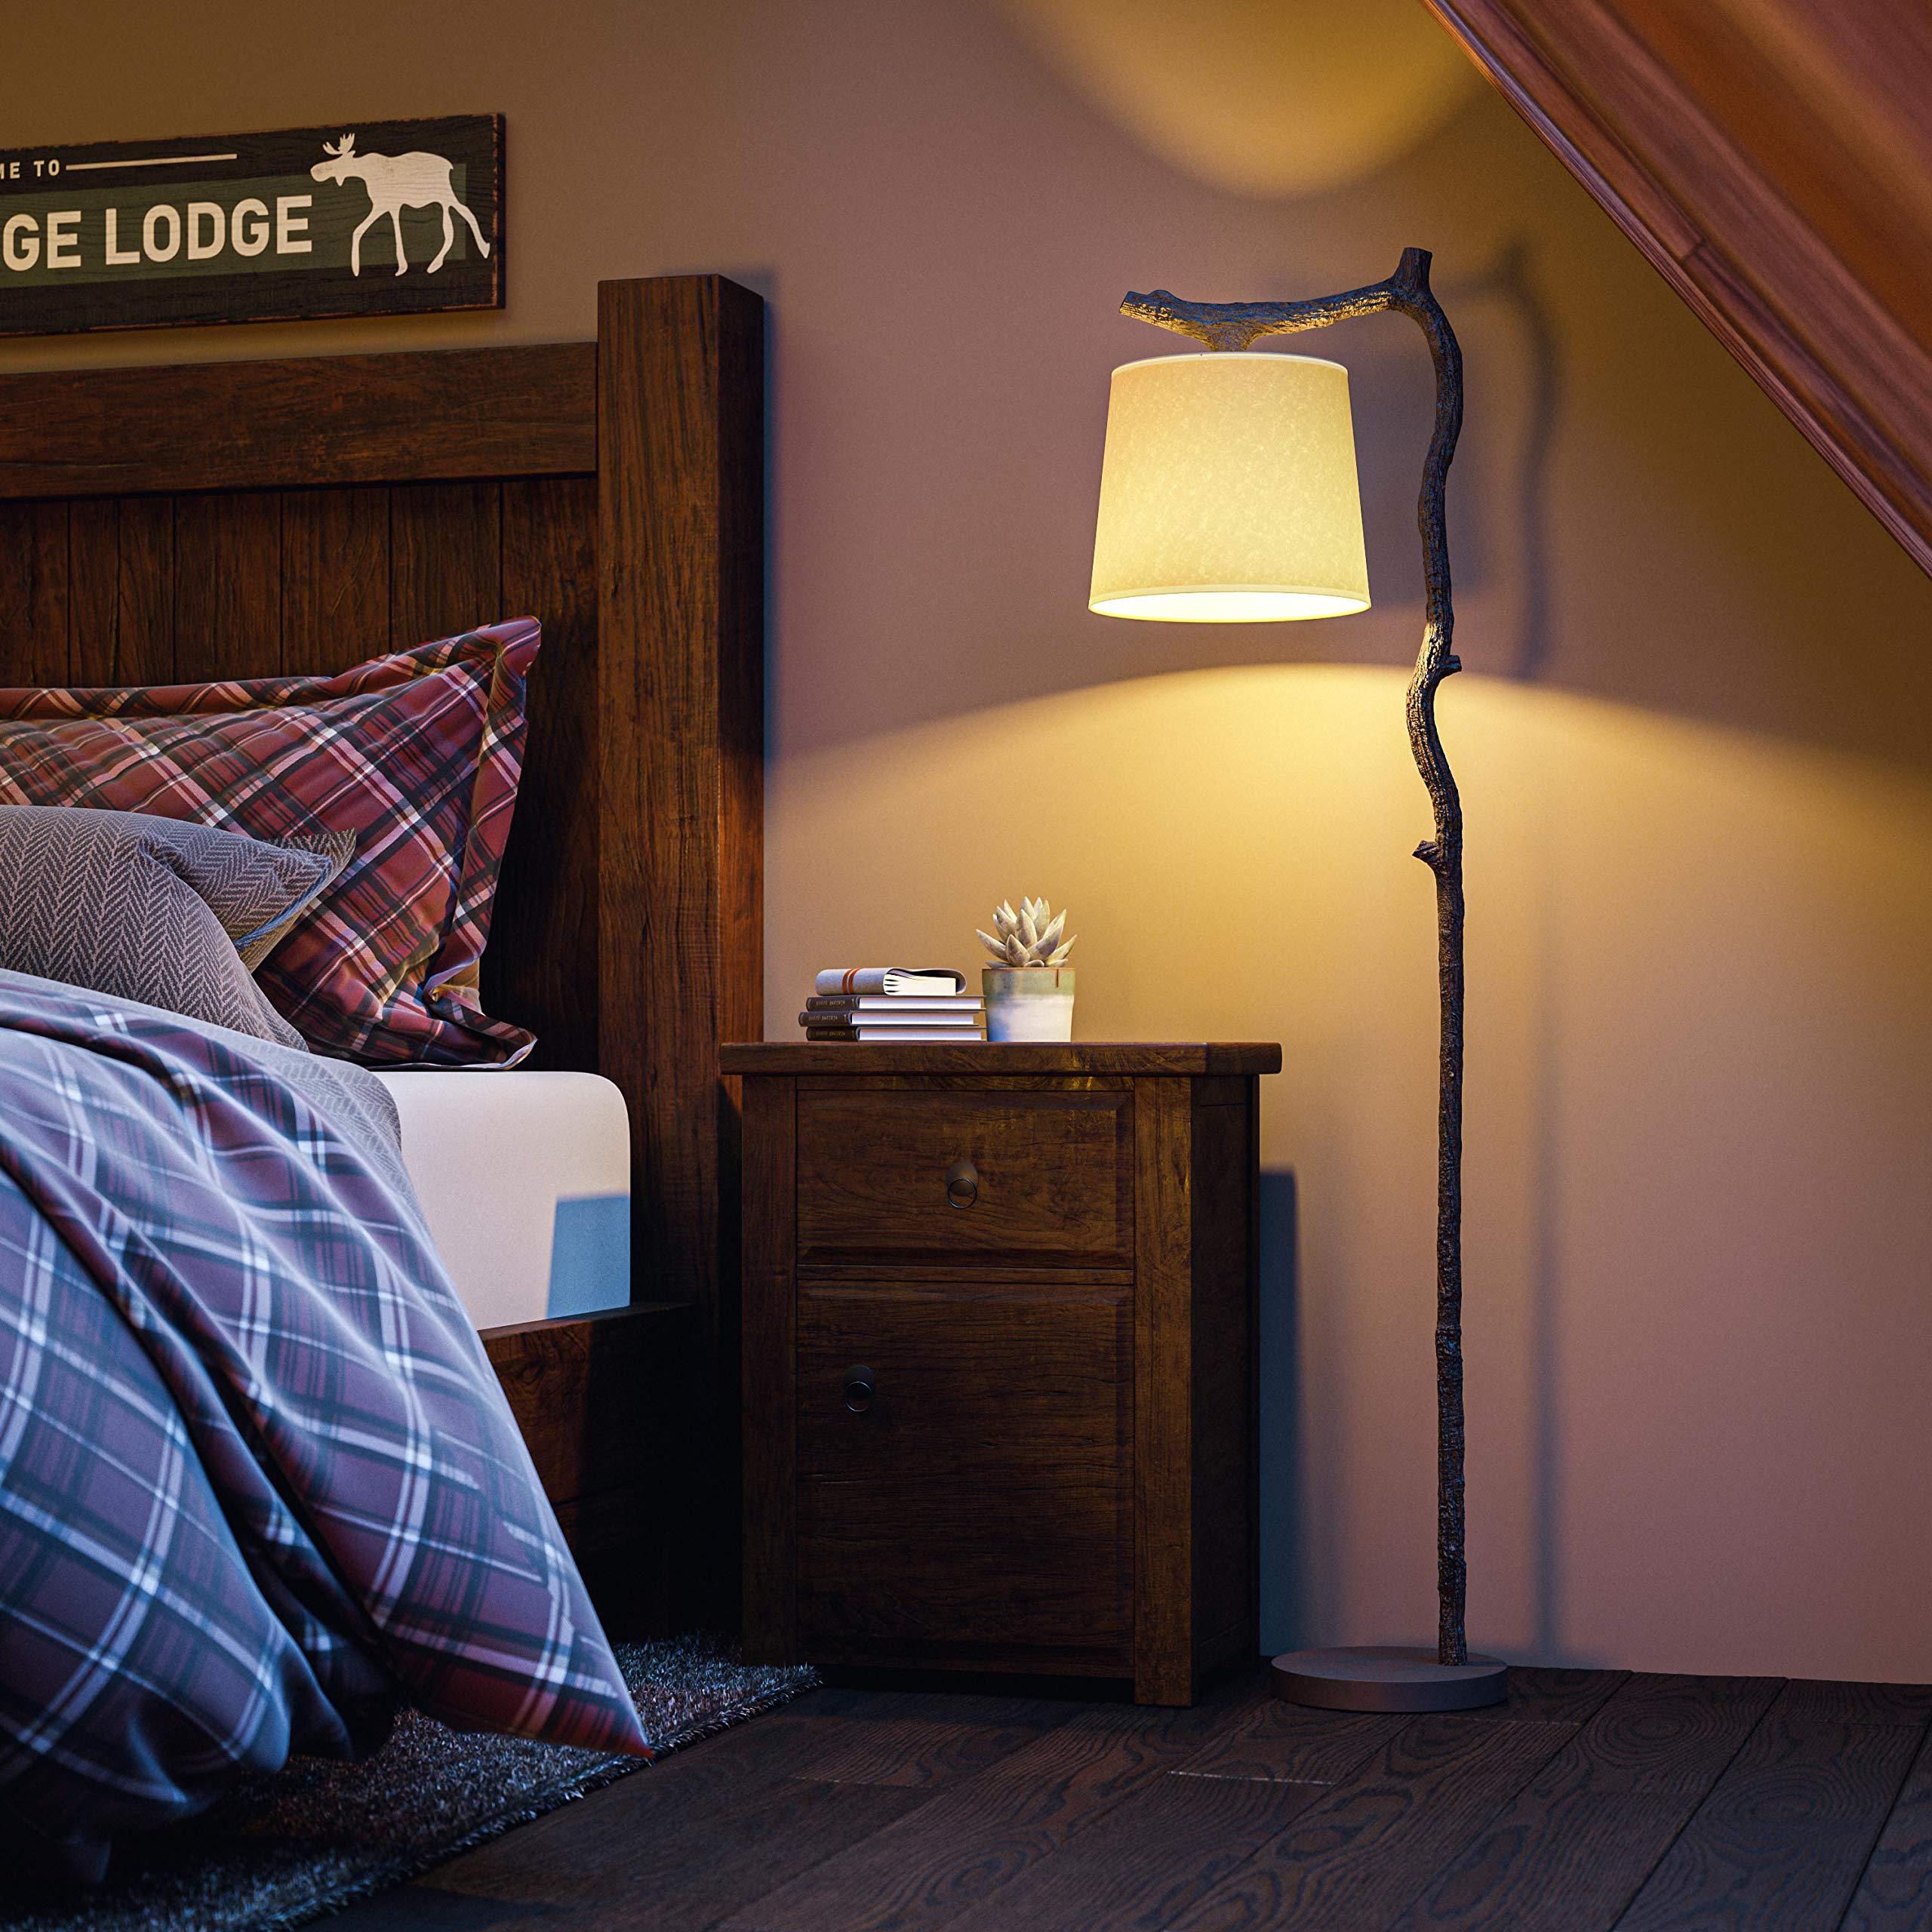 Kenroy-Home-32452BRZD-Rustic-Floor-Lamp. 15 Unique Artistic Floor Lamps to Light Your Bedroom